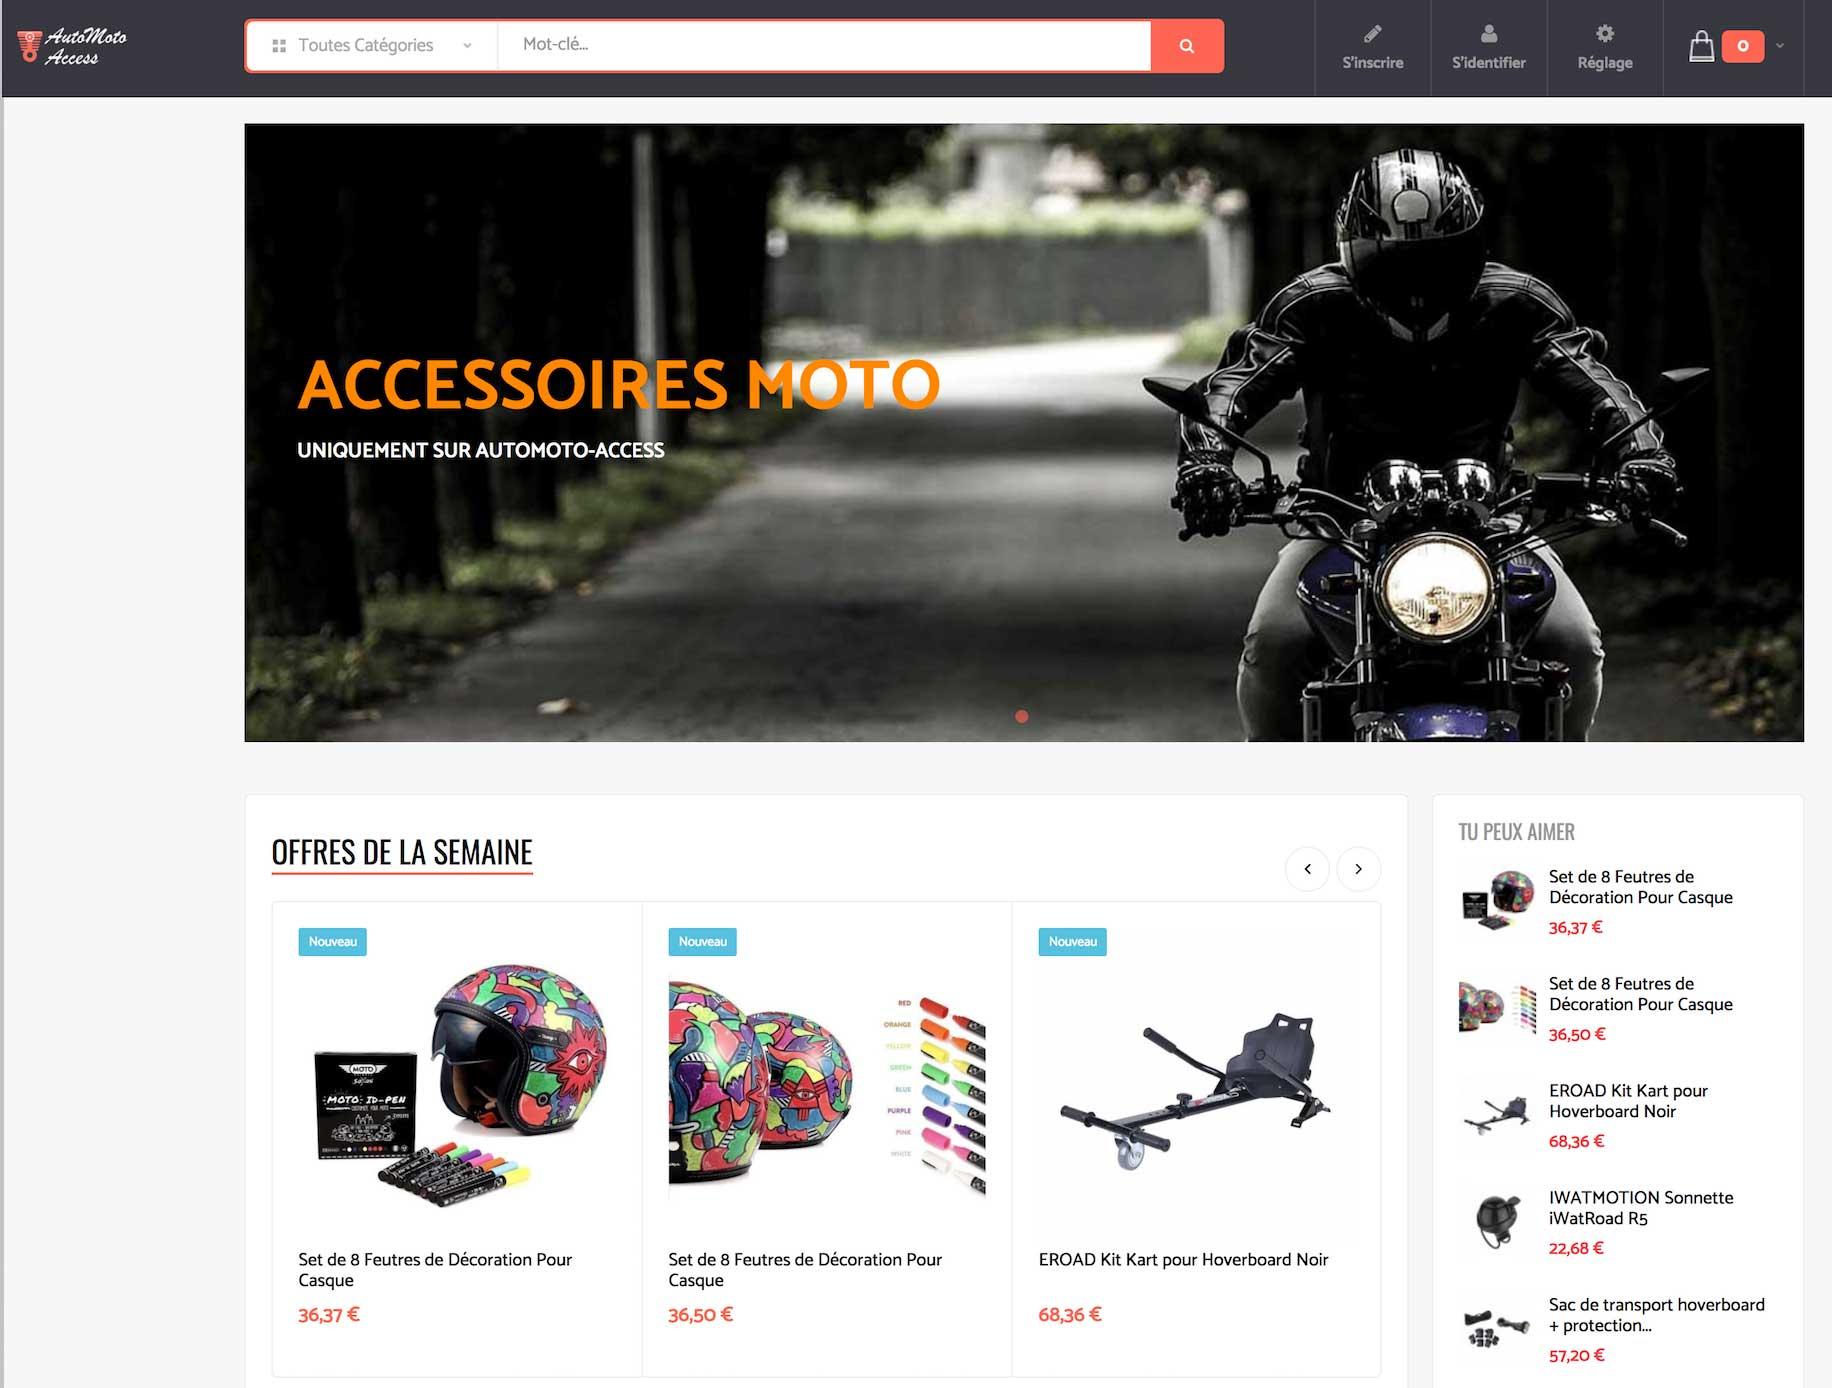 auto-moto-dropshipping accessoires moto